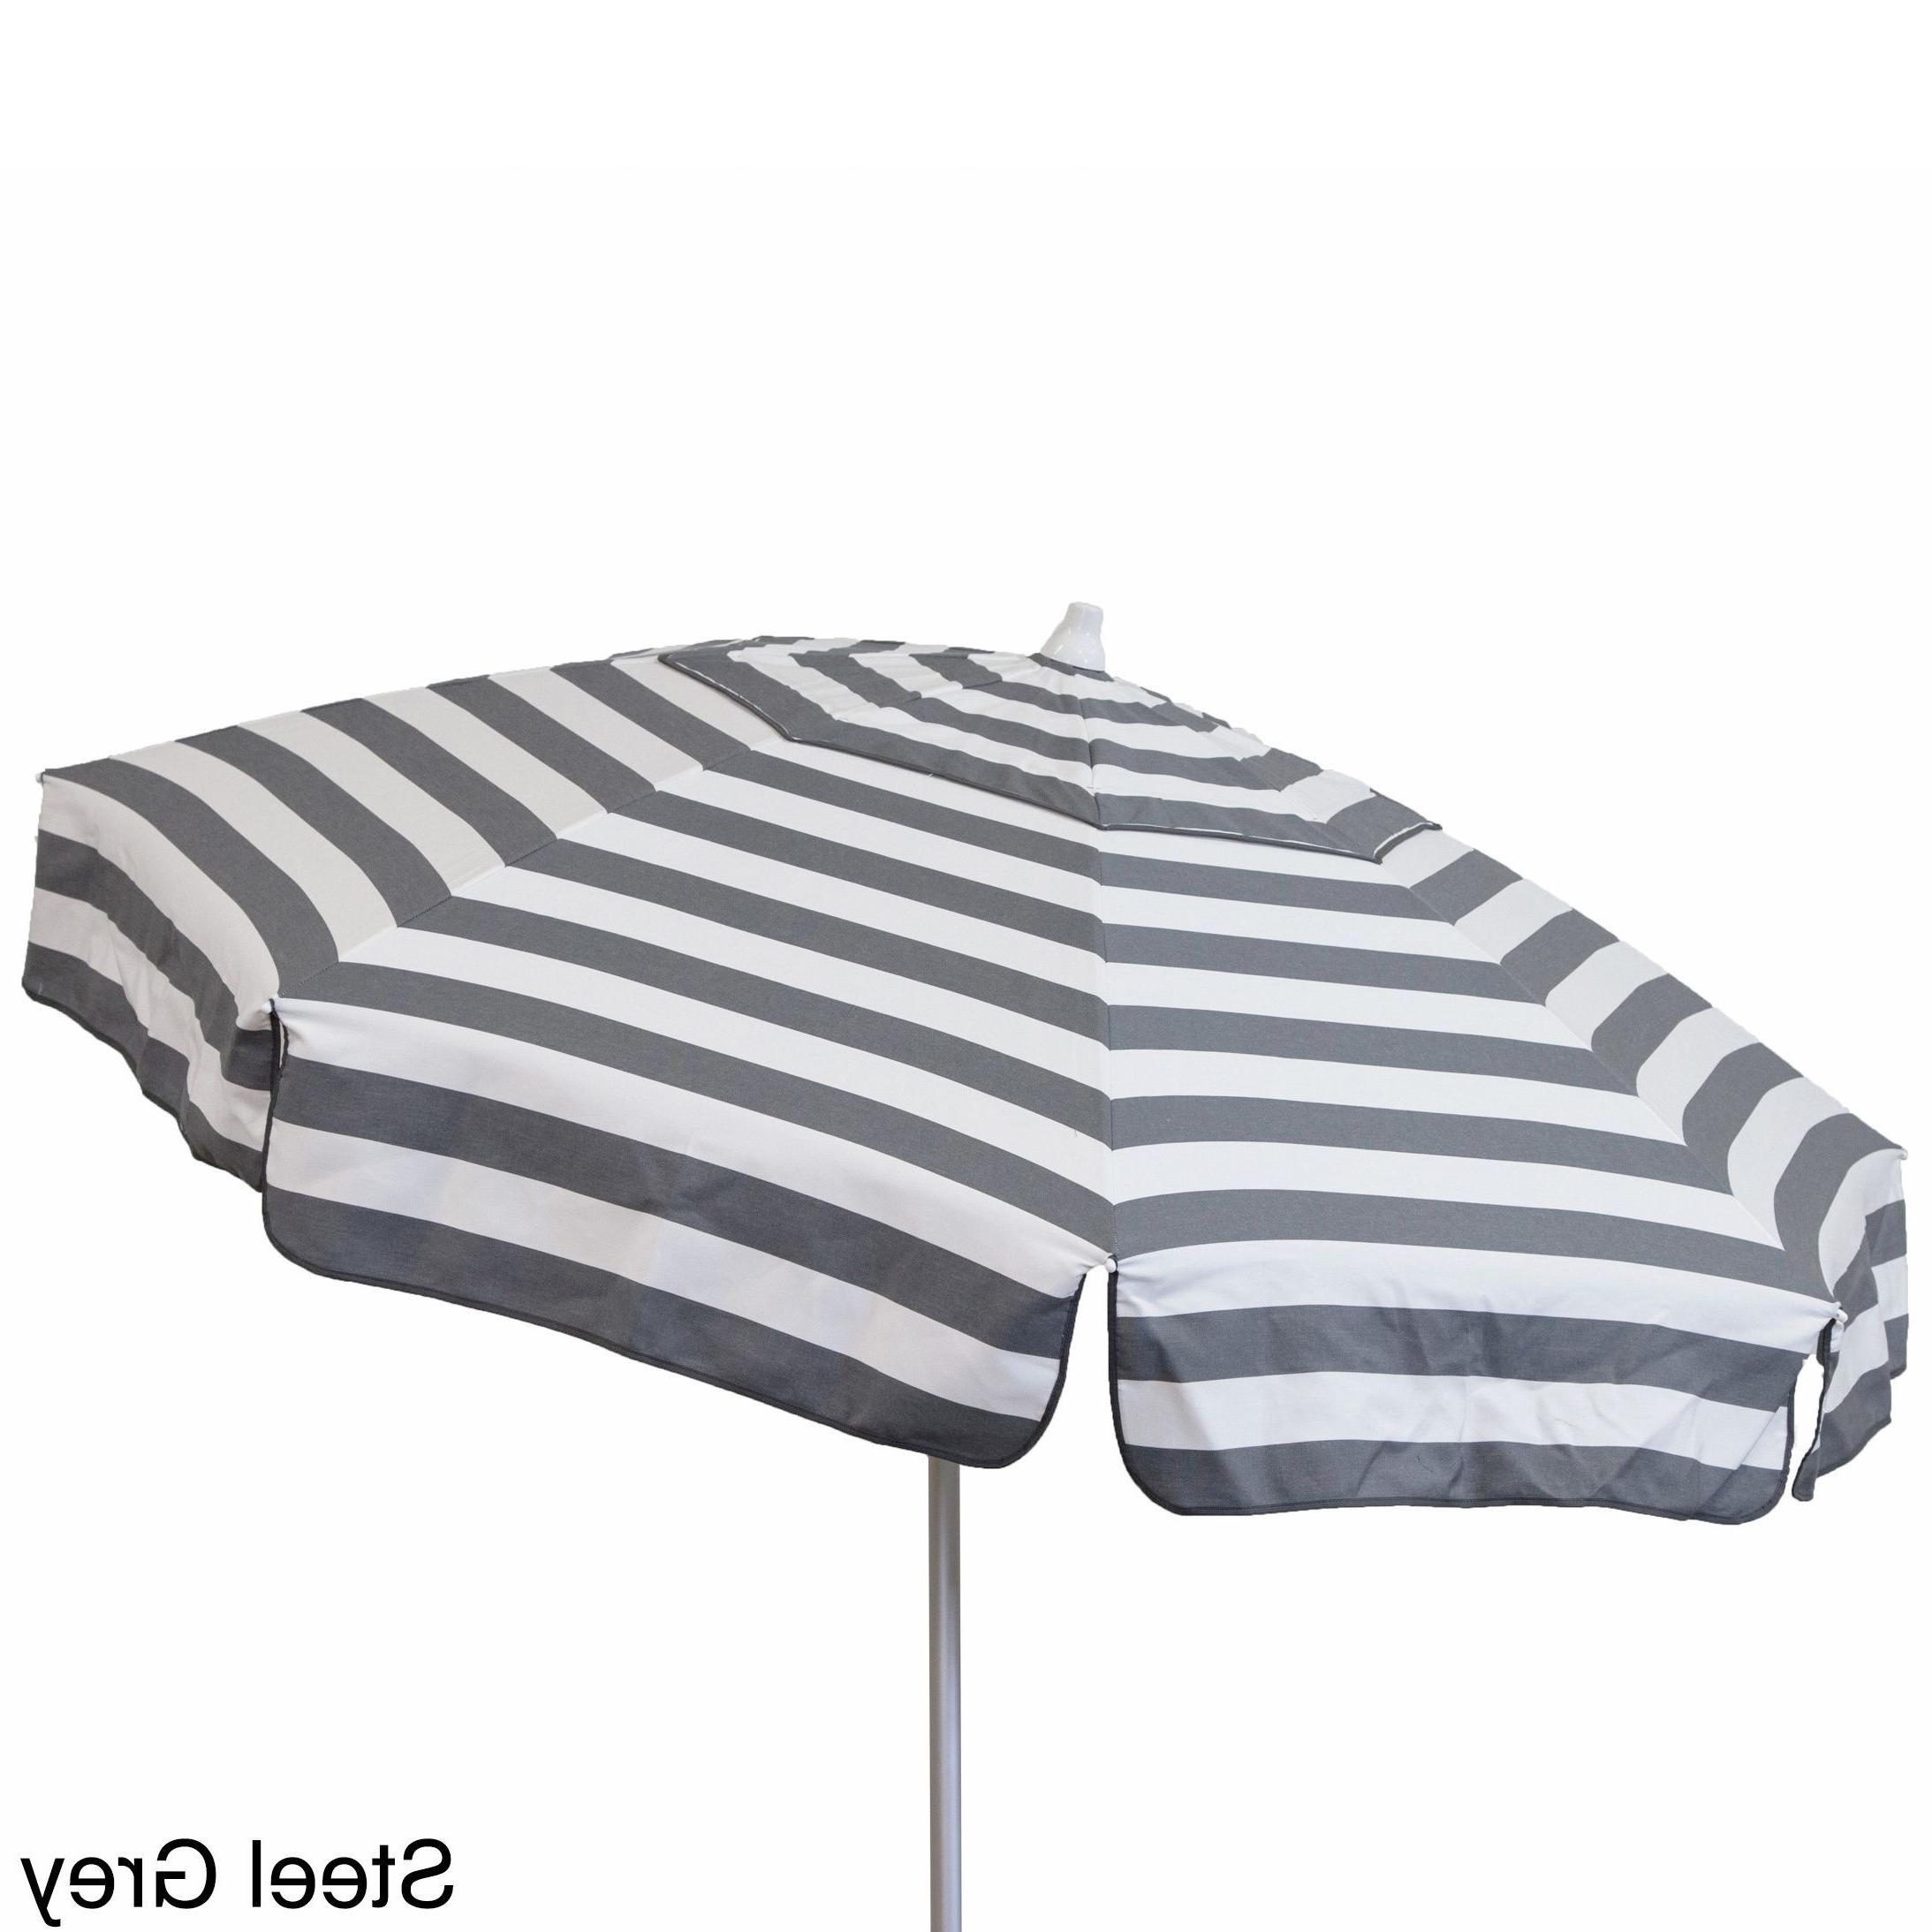 Italian Drape Umbrellas With Recent Euro 6 Foot Striped Umbrella (steel Grey And White – Beach Pole (View 19 of 20)